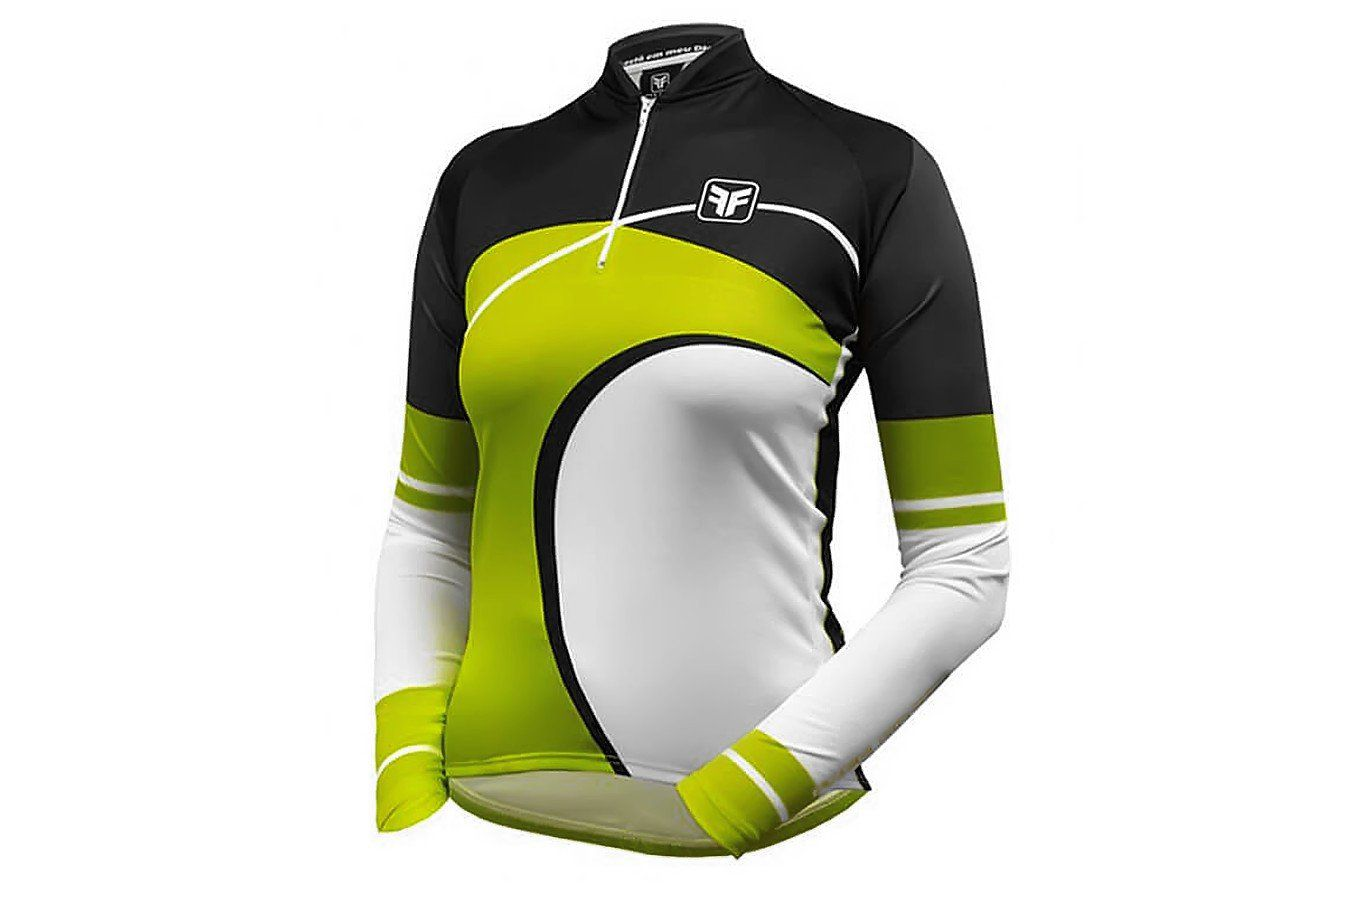 Camisa Ciclismo Manga Longa Free Force Wave- Verde e Preto